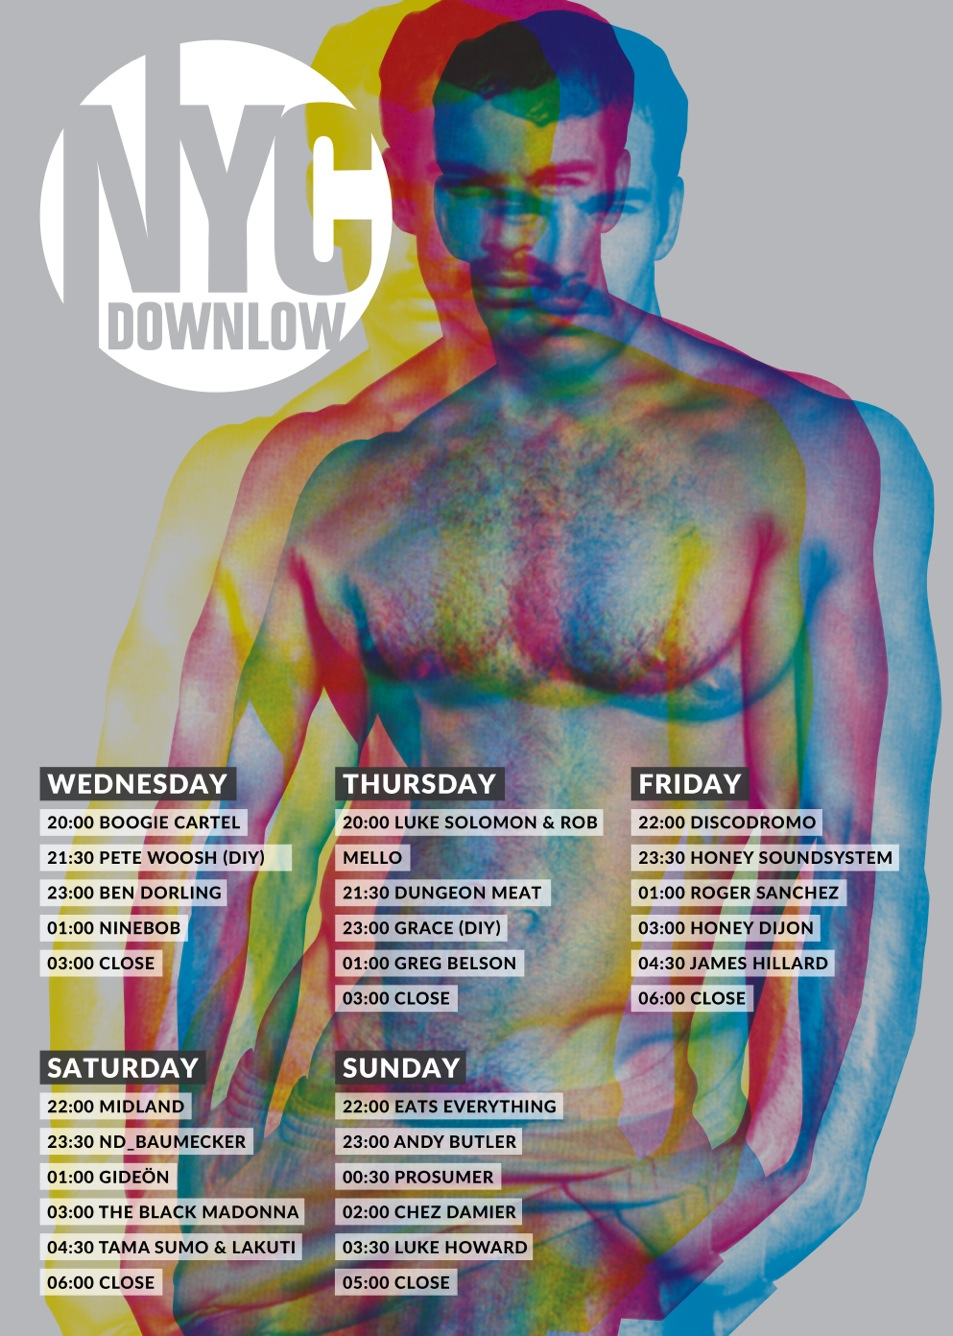 NYC Downlow 2016 full_953x1336px